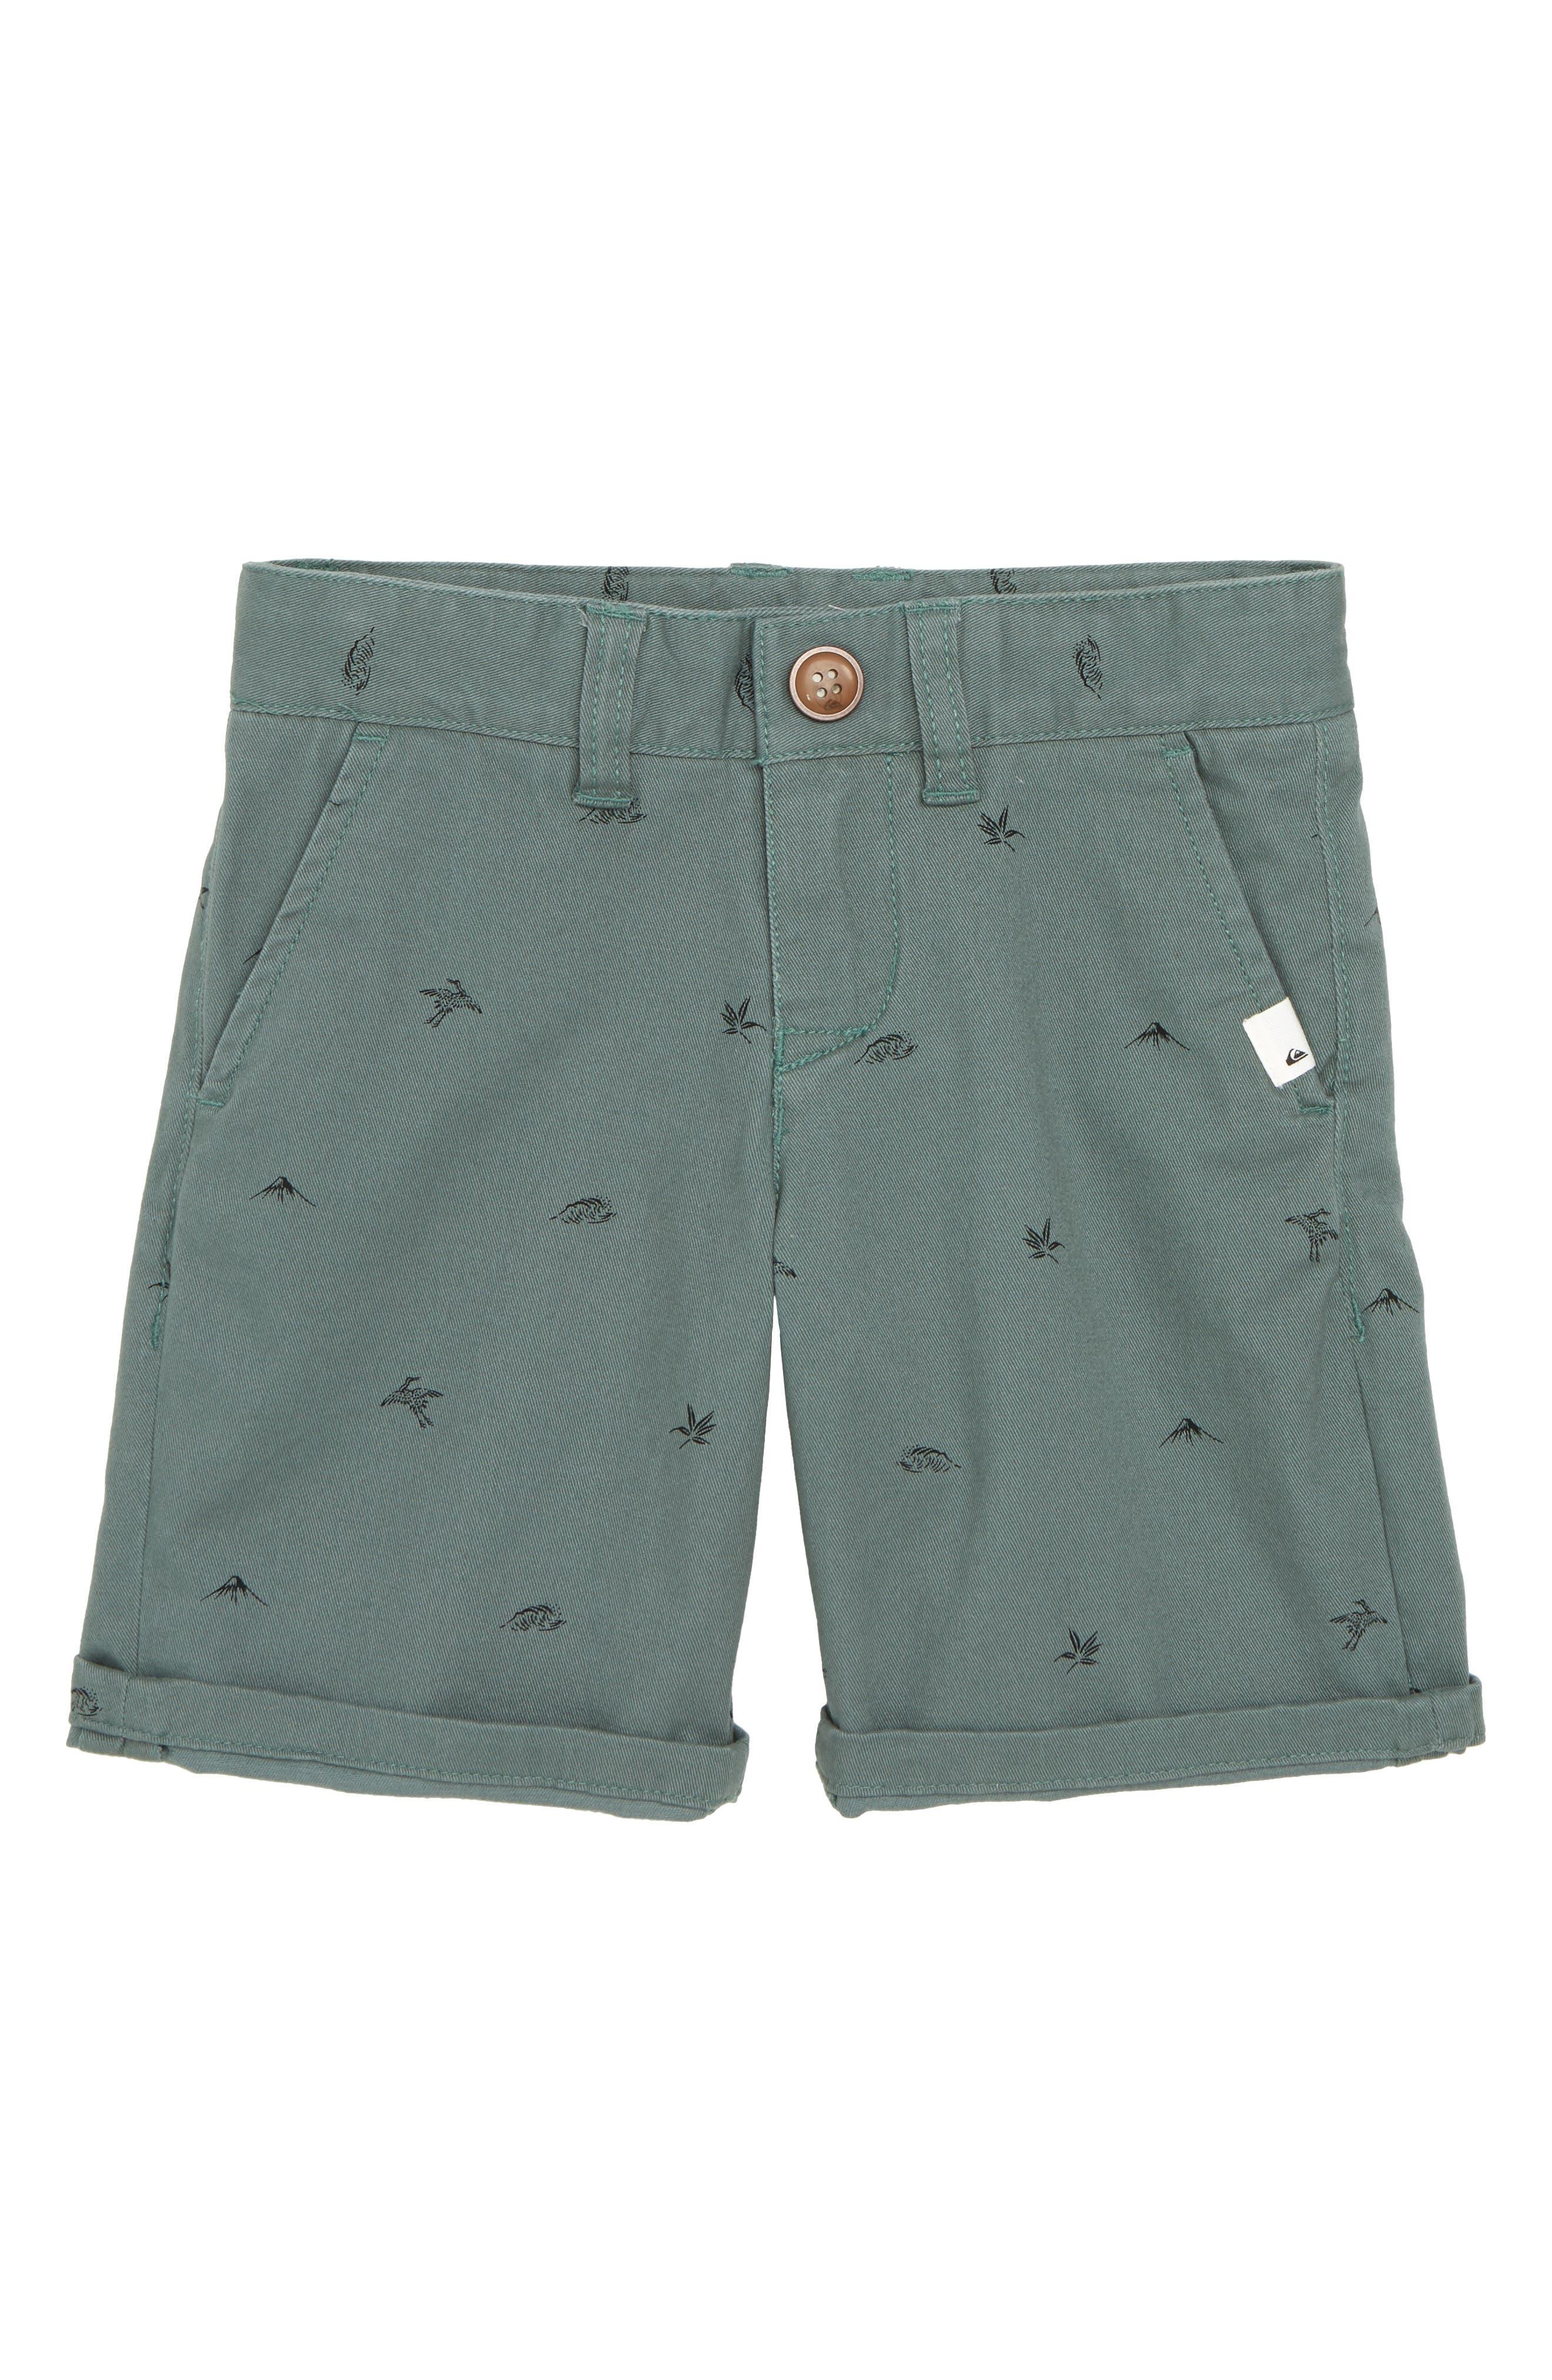 Fuji Stretch Cotton Shorts,                             Main thumbnail 1, color,                             301